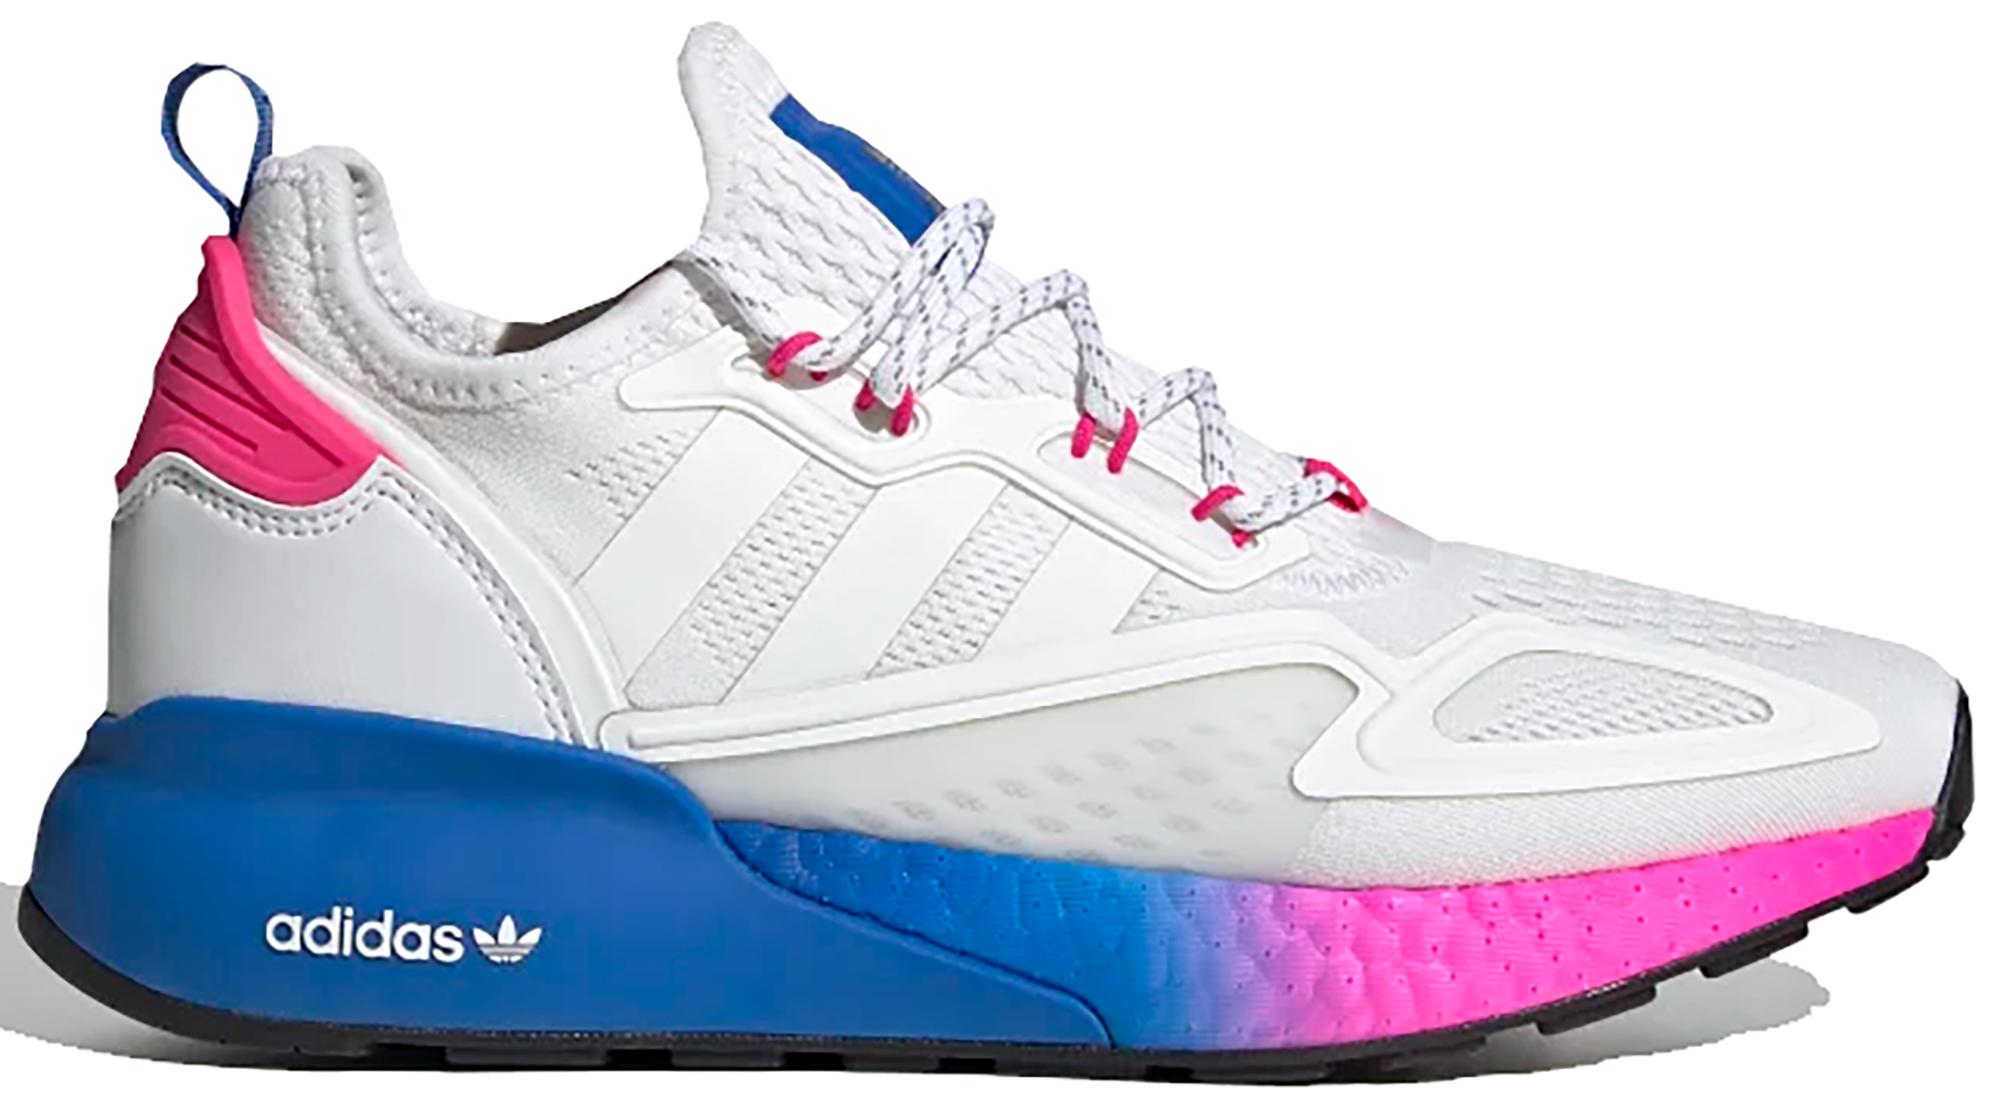 adidas ZX 2K Boost White Pink Blue (W